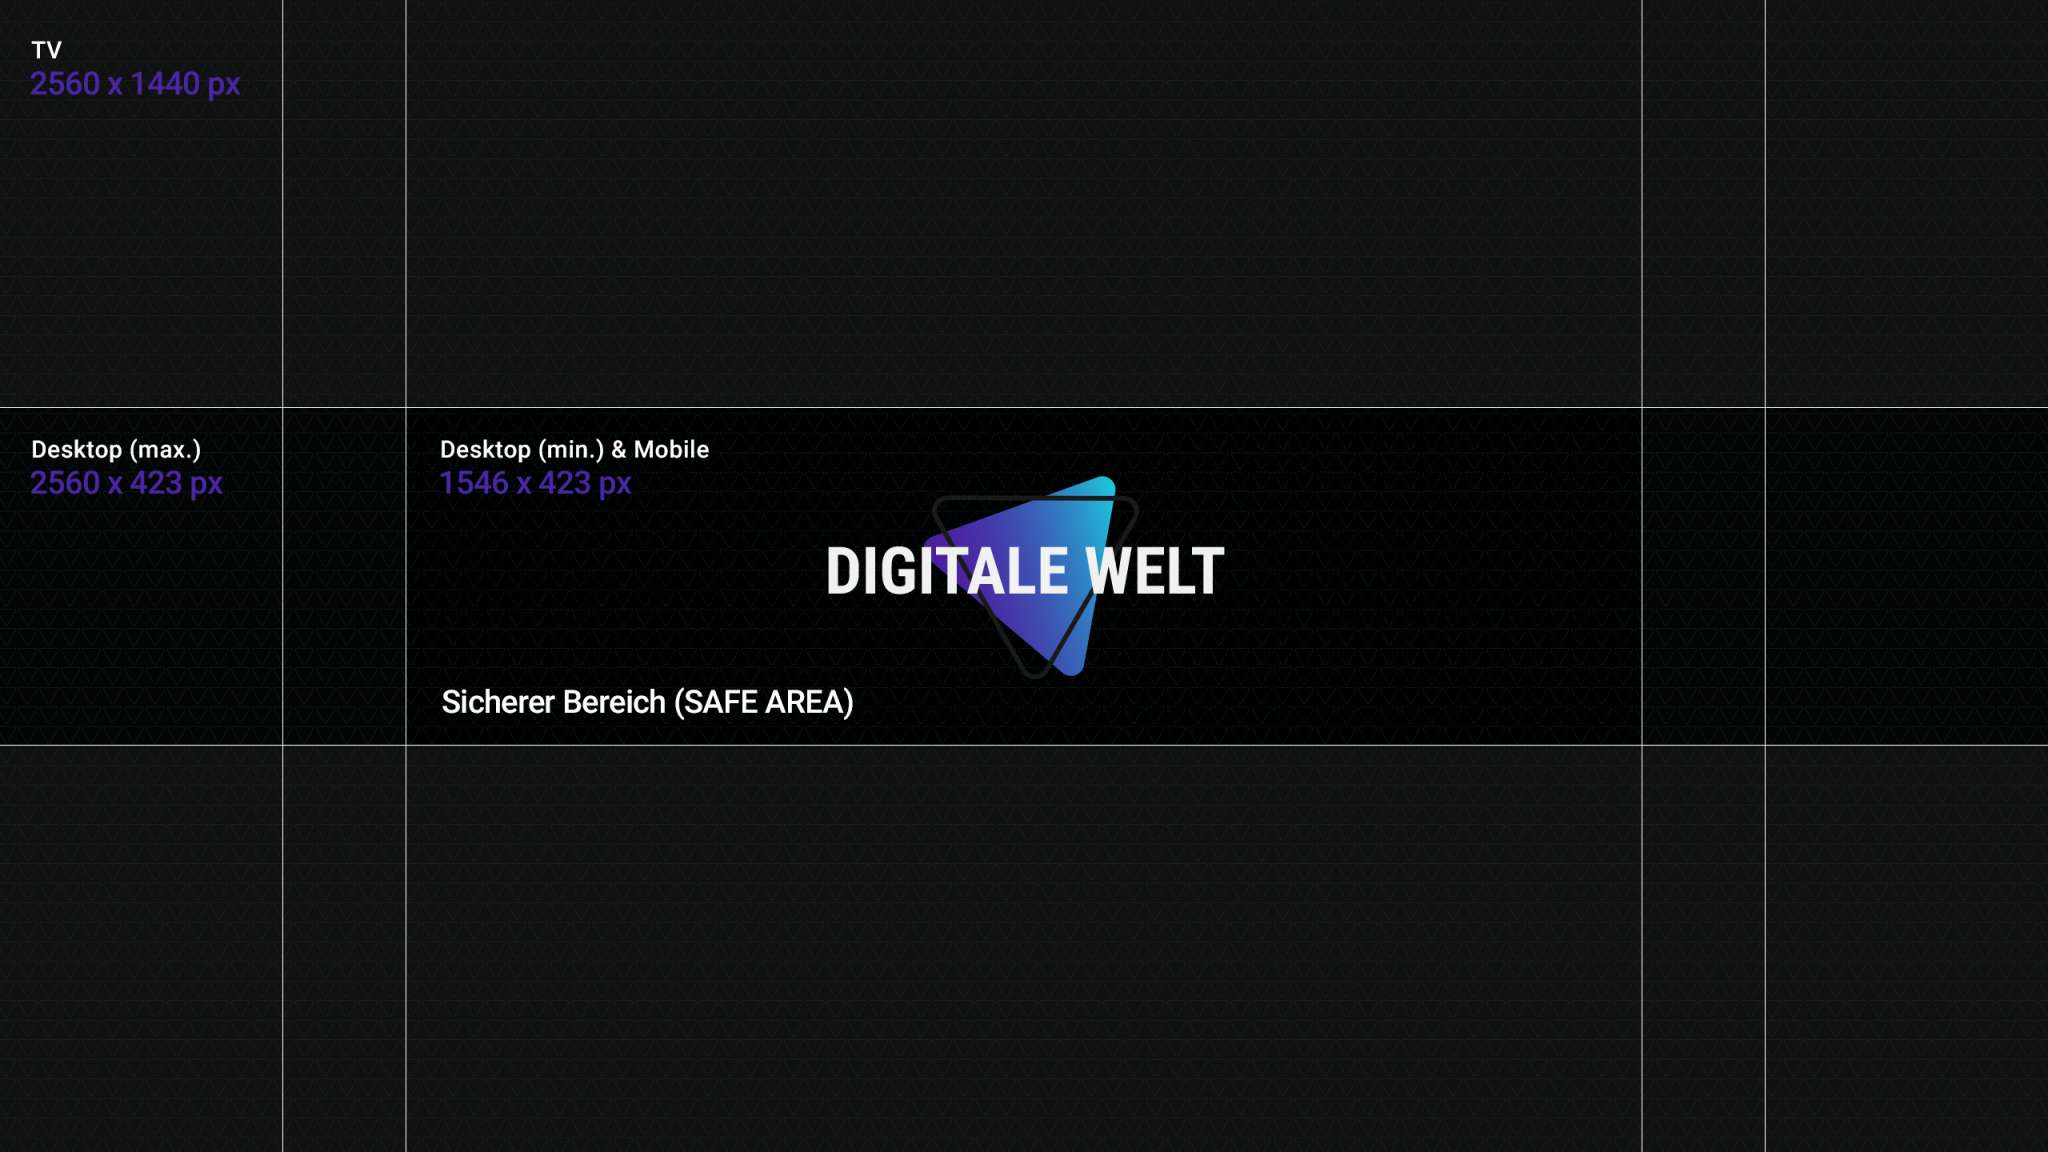 Youtube Kanalbild Template 2018 Digitalewelt Digitale Welt